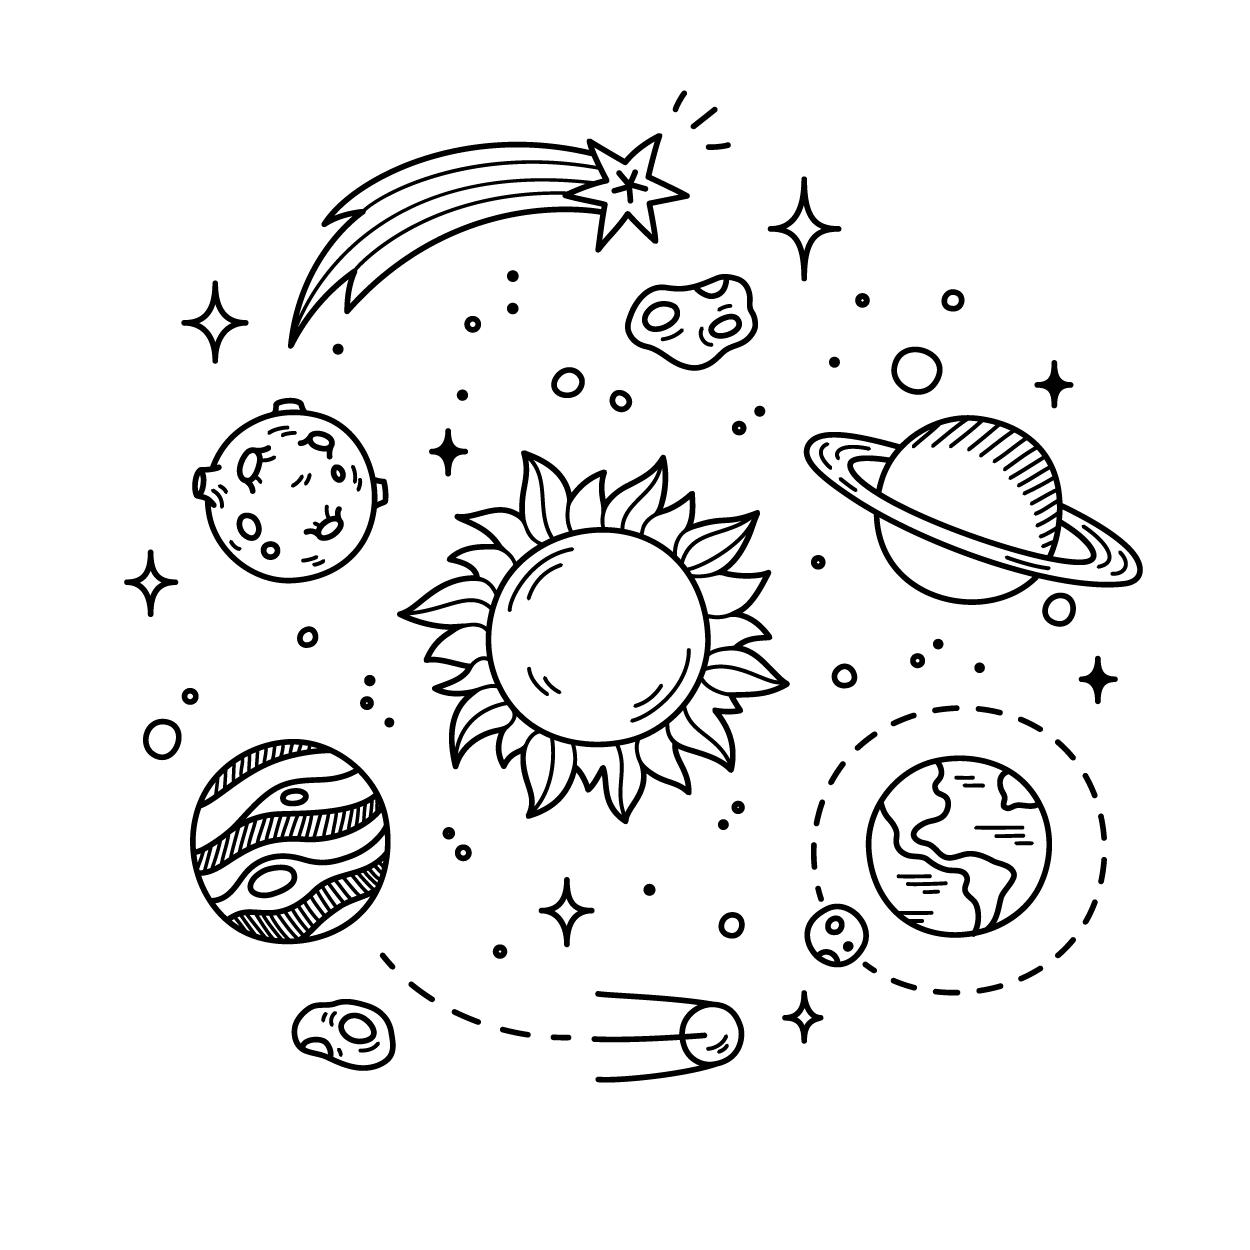 Spaceship Of Alien Illustration Google 검색 Stick And Poke